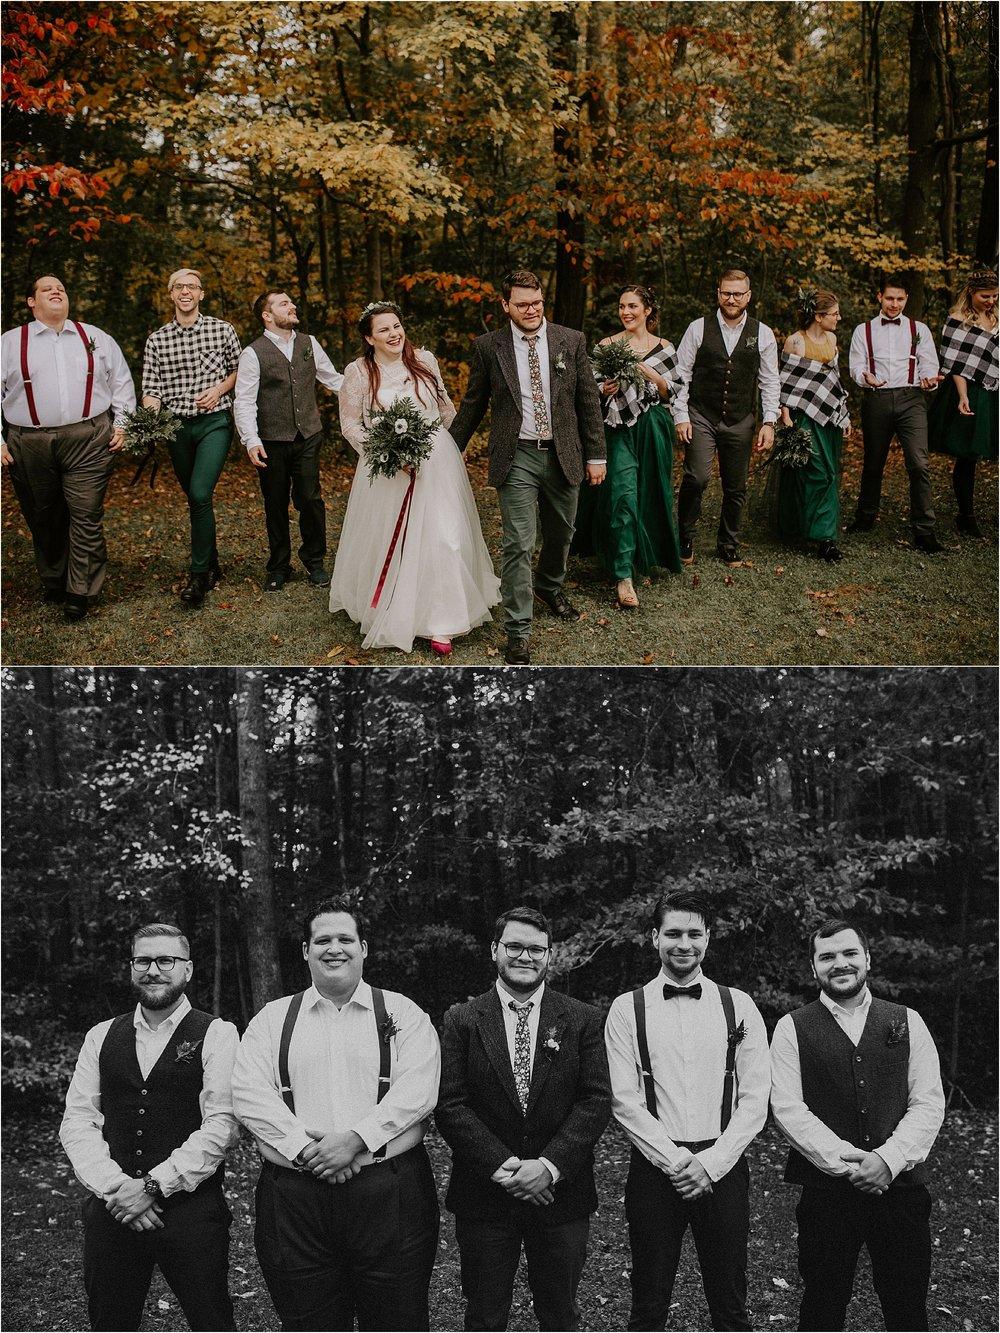 Sarah_Brookhart_Baltimore_Wedding_Photographer_0032.jpg